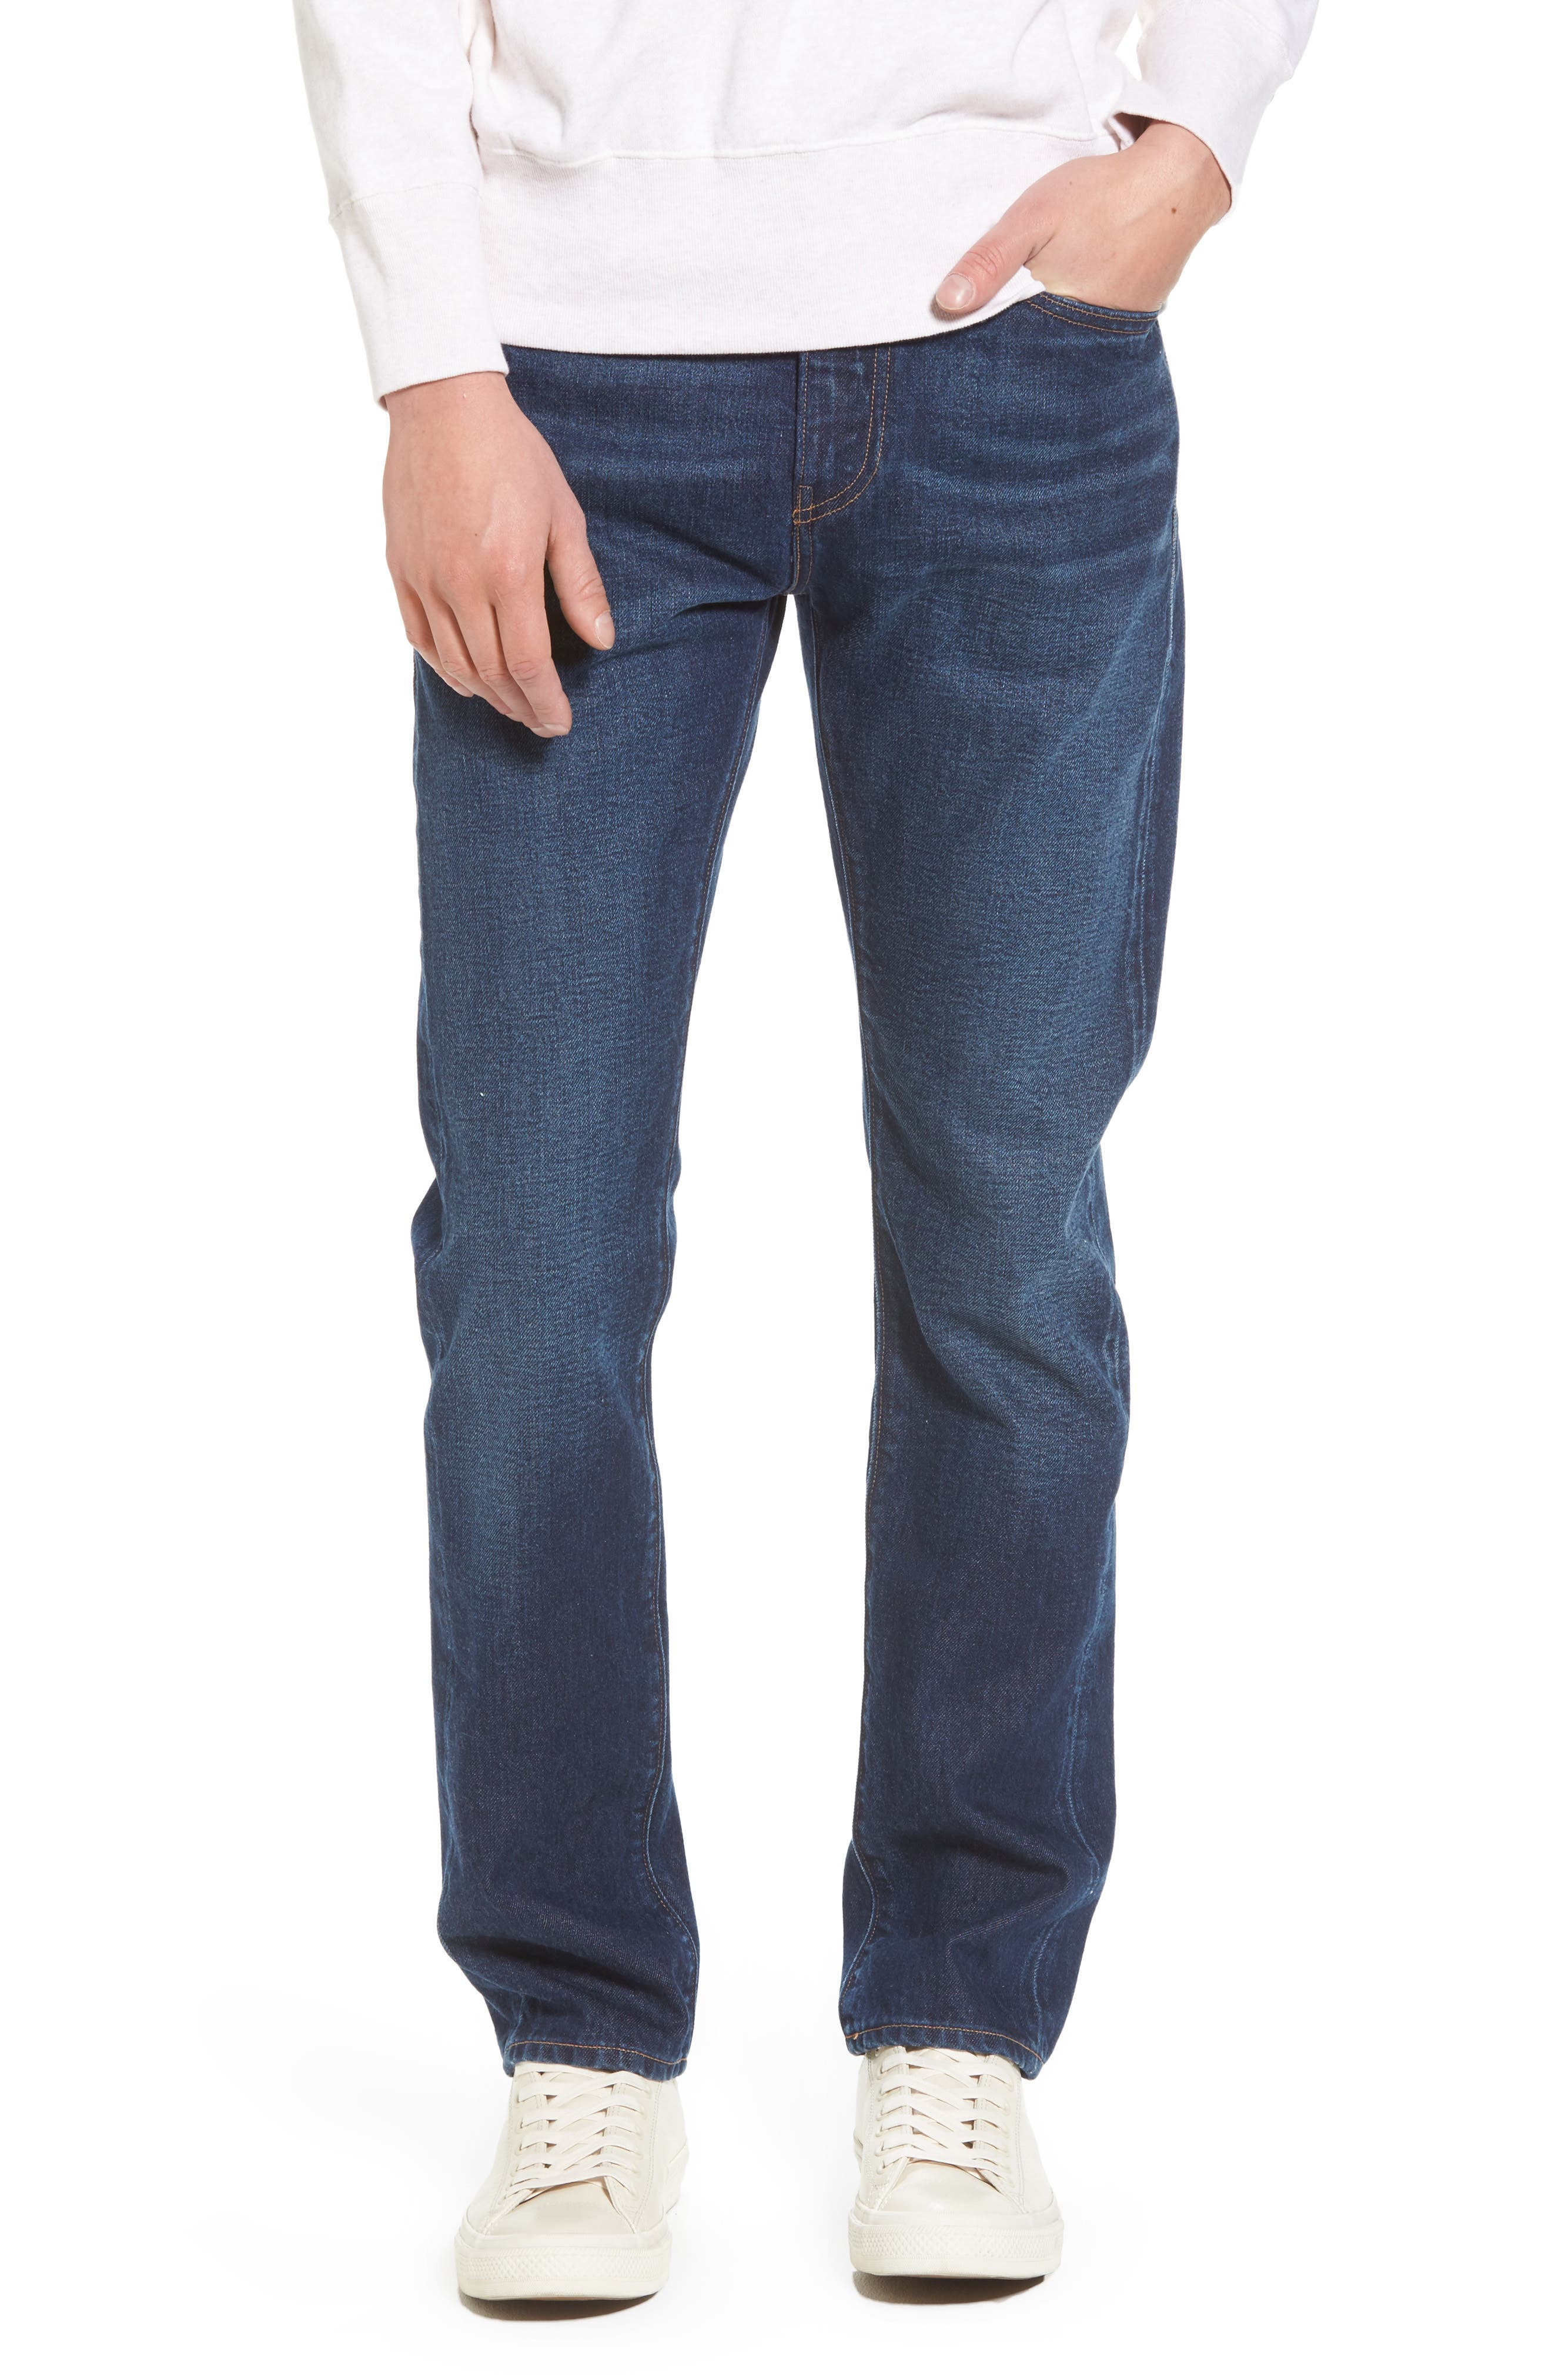 Tack Slim Fit Jeans,                         Main,                         color, 401